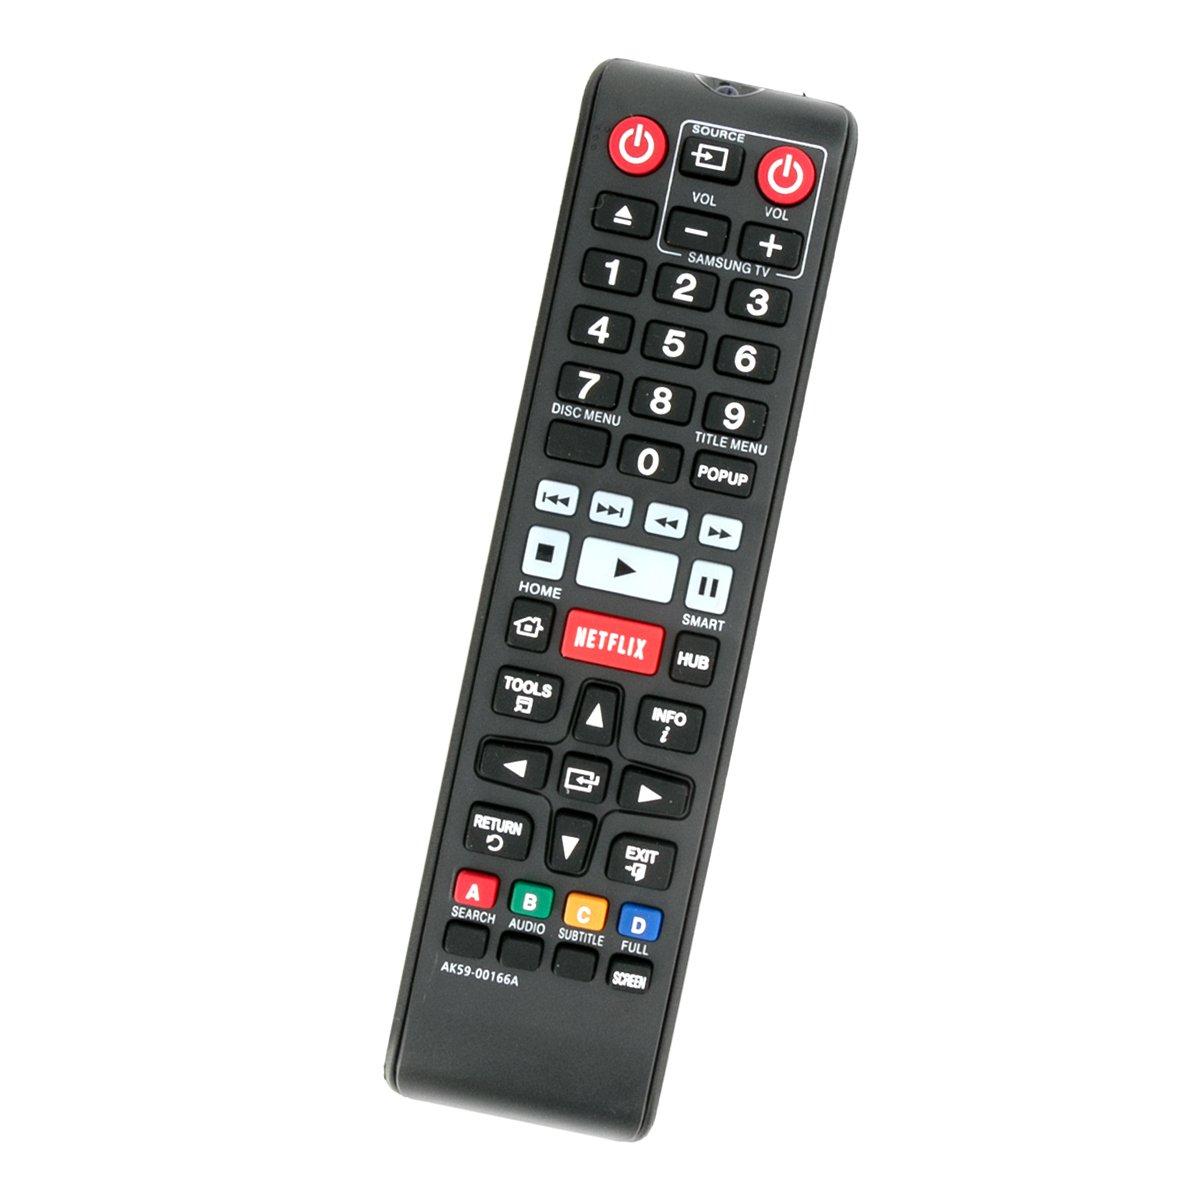 AK59-00166A Replaced Remote Control fit for Samsung Blu-ray Disc Player BD-FM59  BD-FM59C BD-F5900 BD-F7500 BD-FM59/ZA BD-FM59C/ZA BDFM59 BDFM59C BDF5900 ...